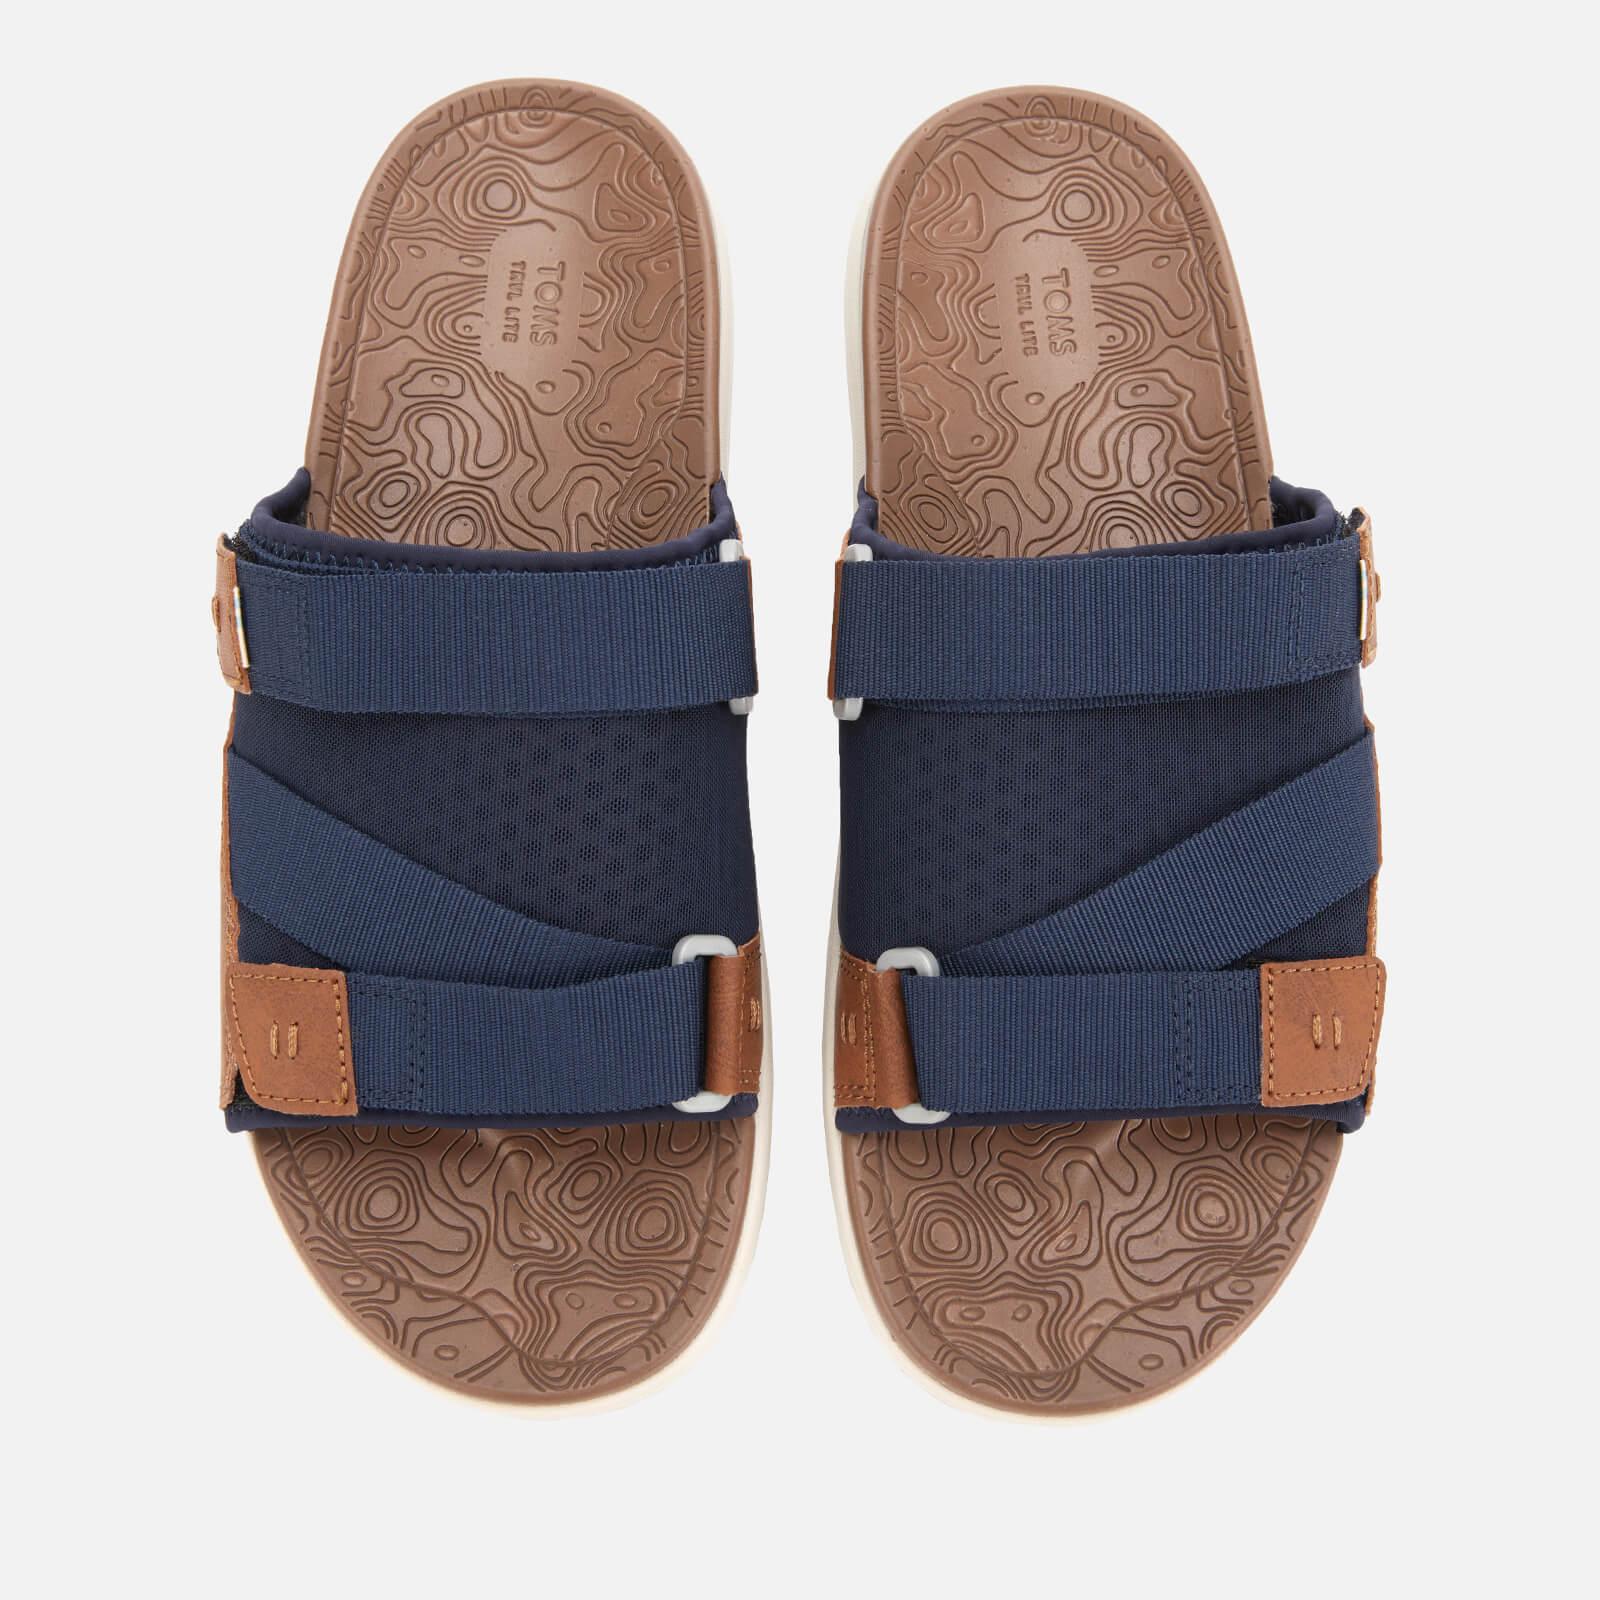 7d48ec888cc TOMS Men s Trvl Vegan Lite Sandals - Navy Mens Footwear